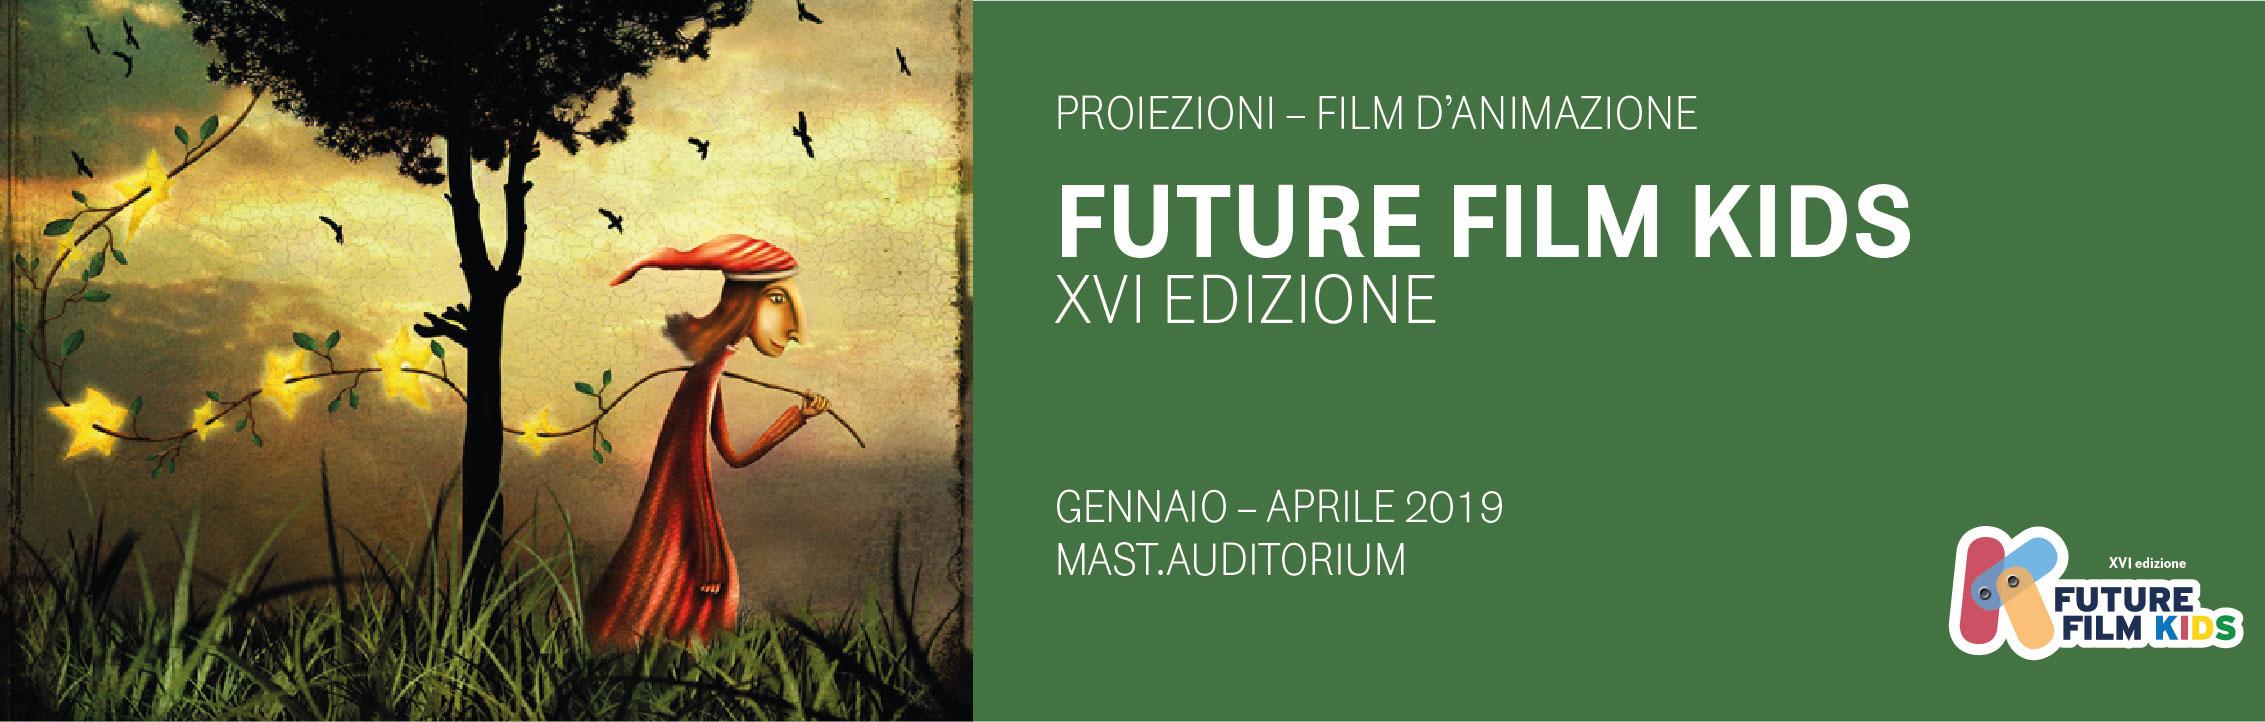 future film kids